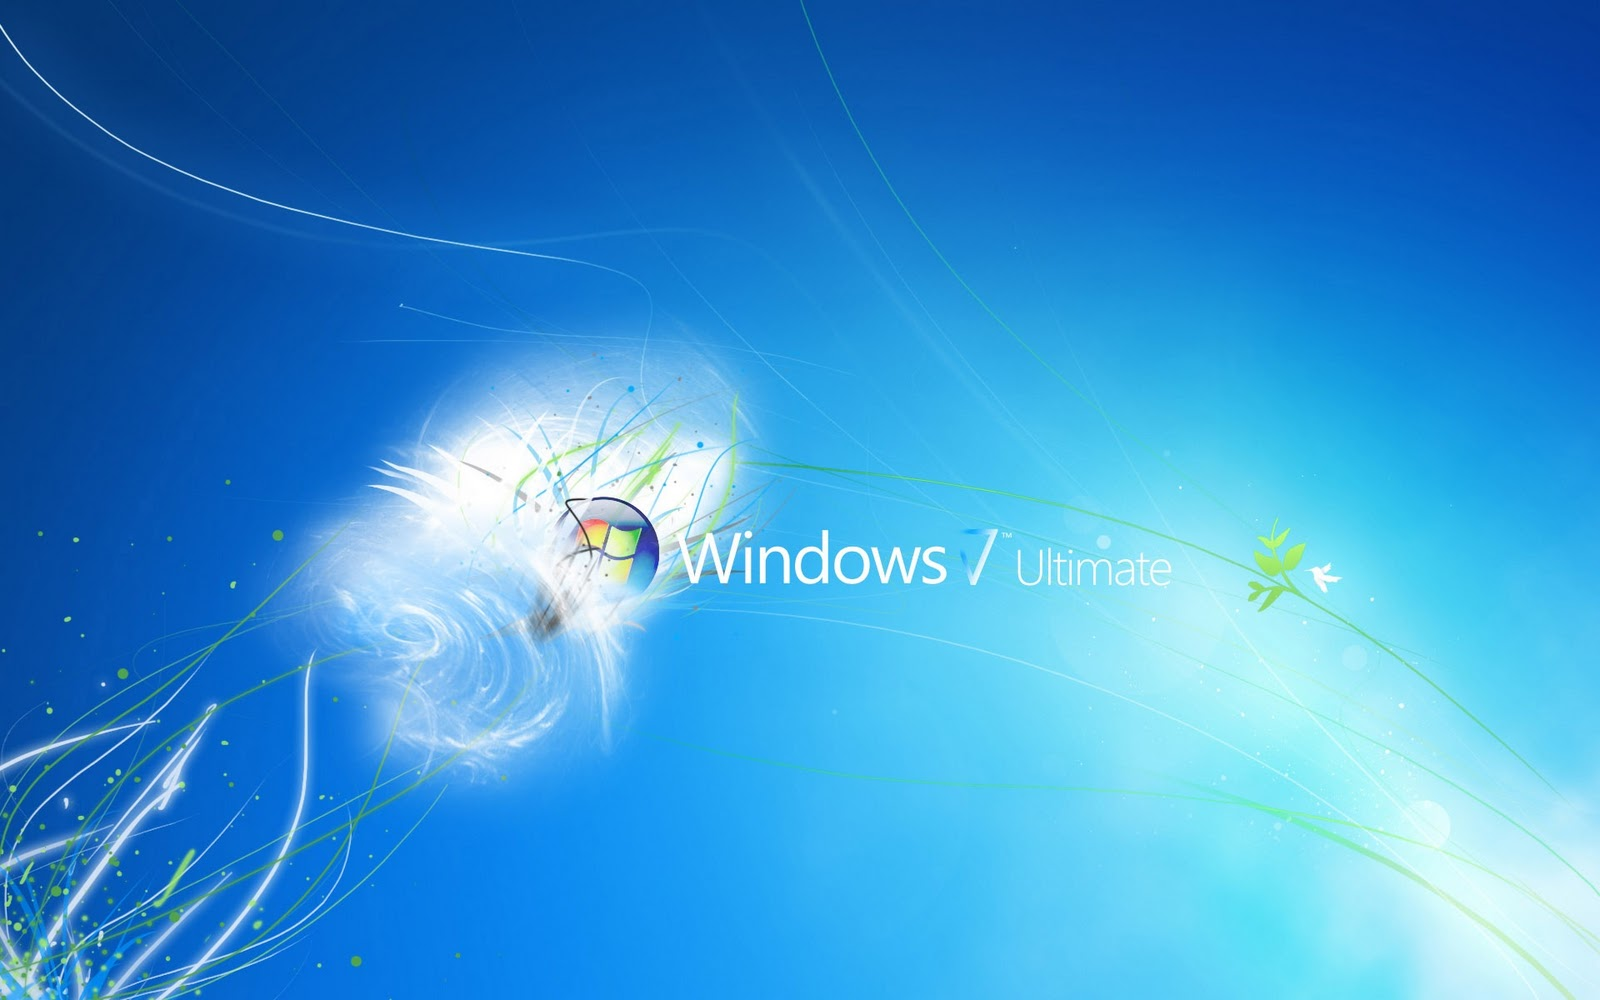 Live Wallpapers Windows 8 28 Wallpapers: 3D Live Wallpaper Windows 8